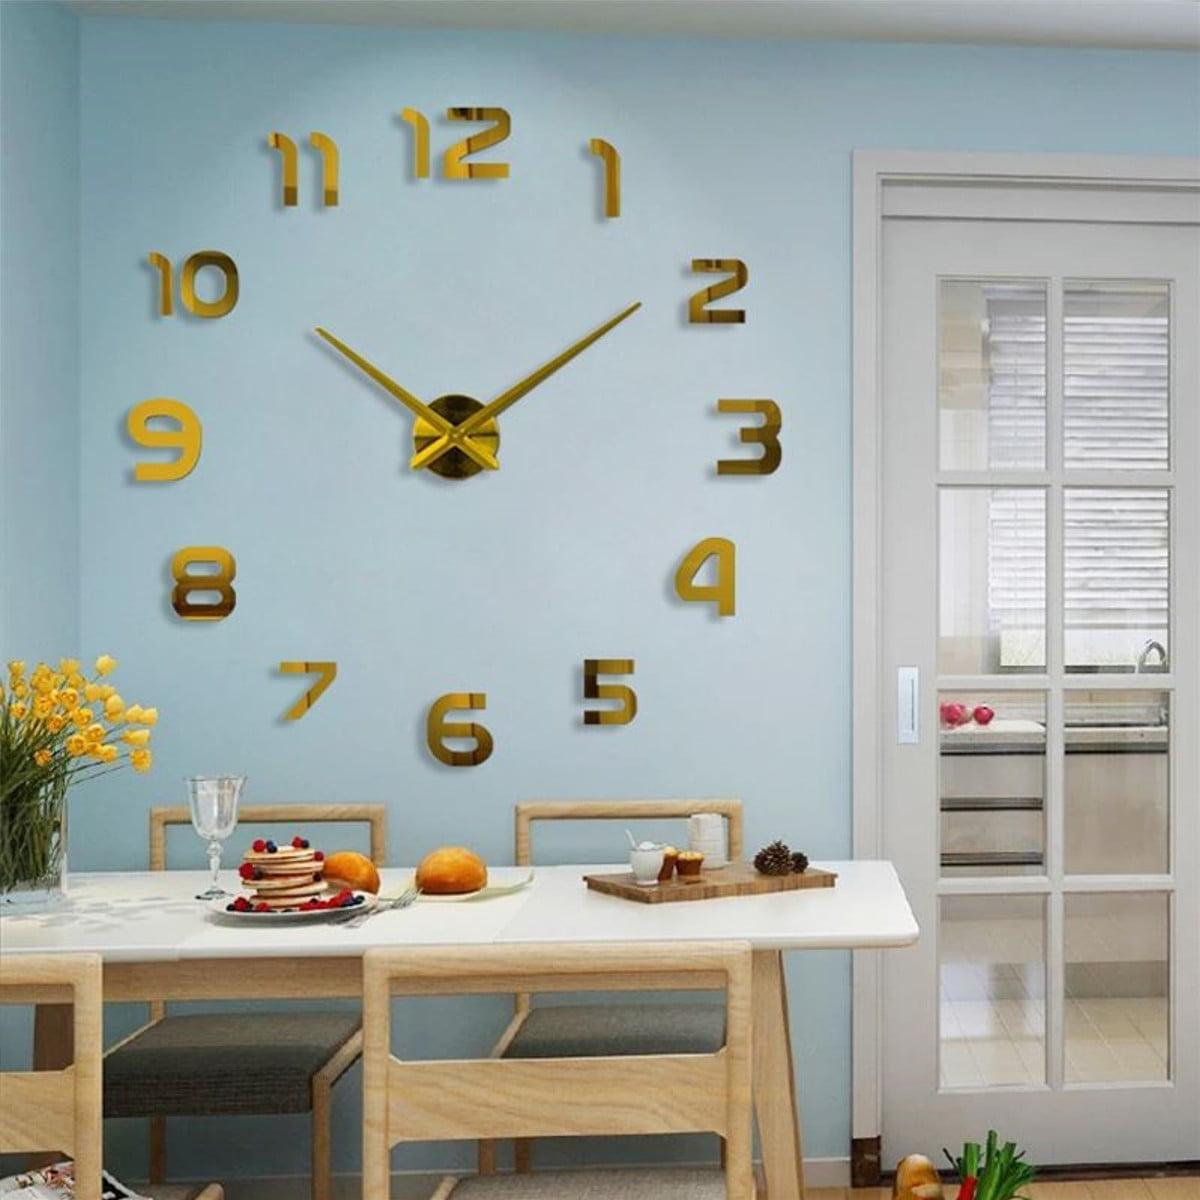 Mirror Wall Sticker Diy Home Decor